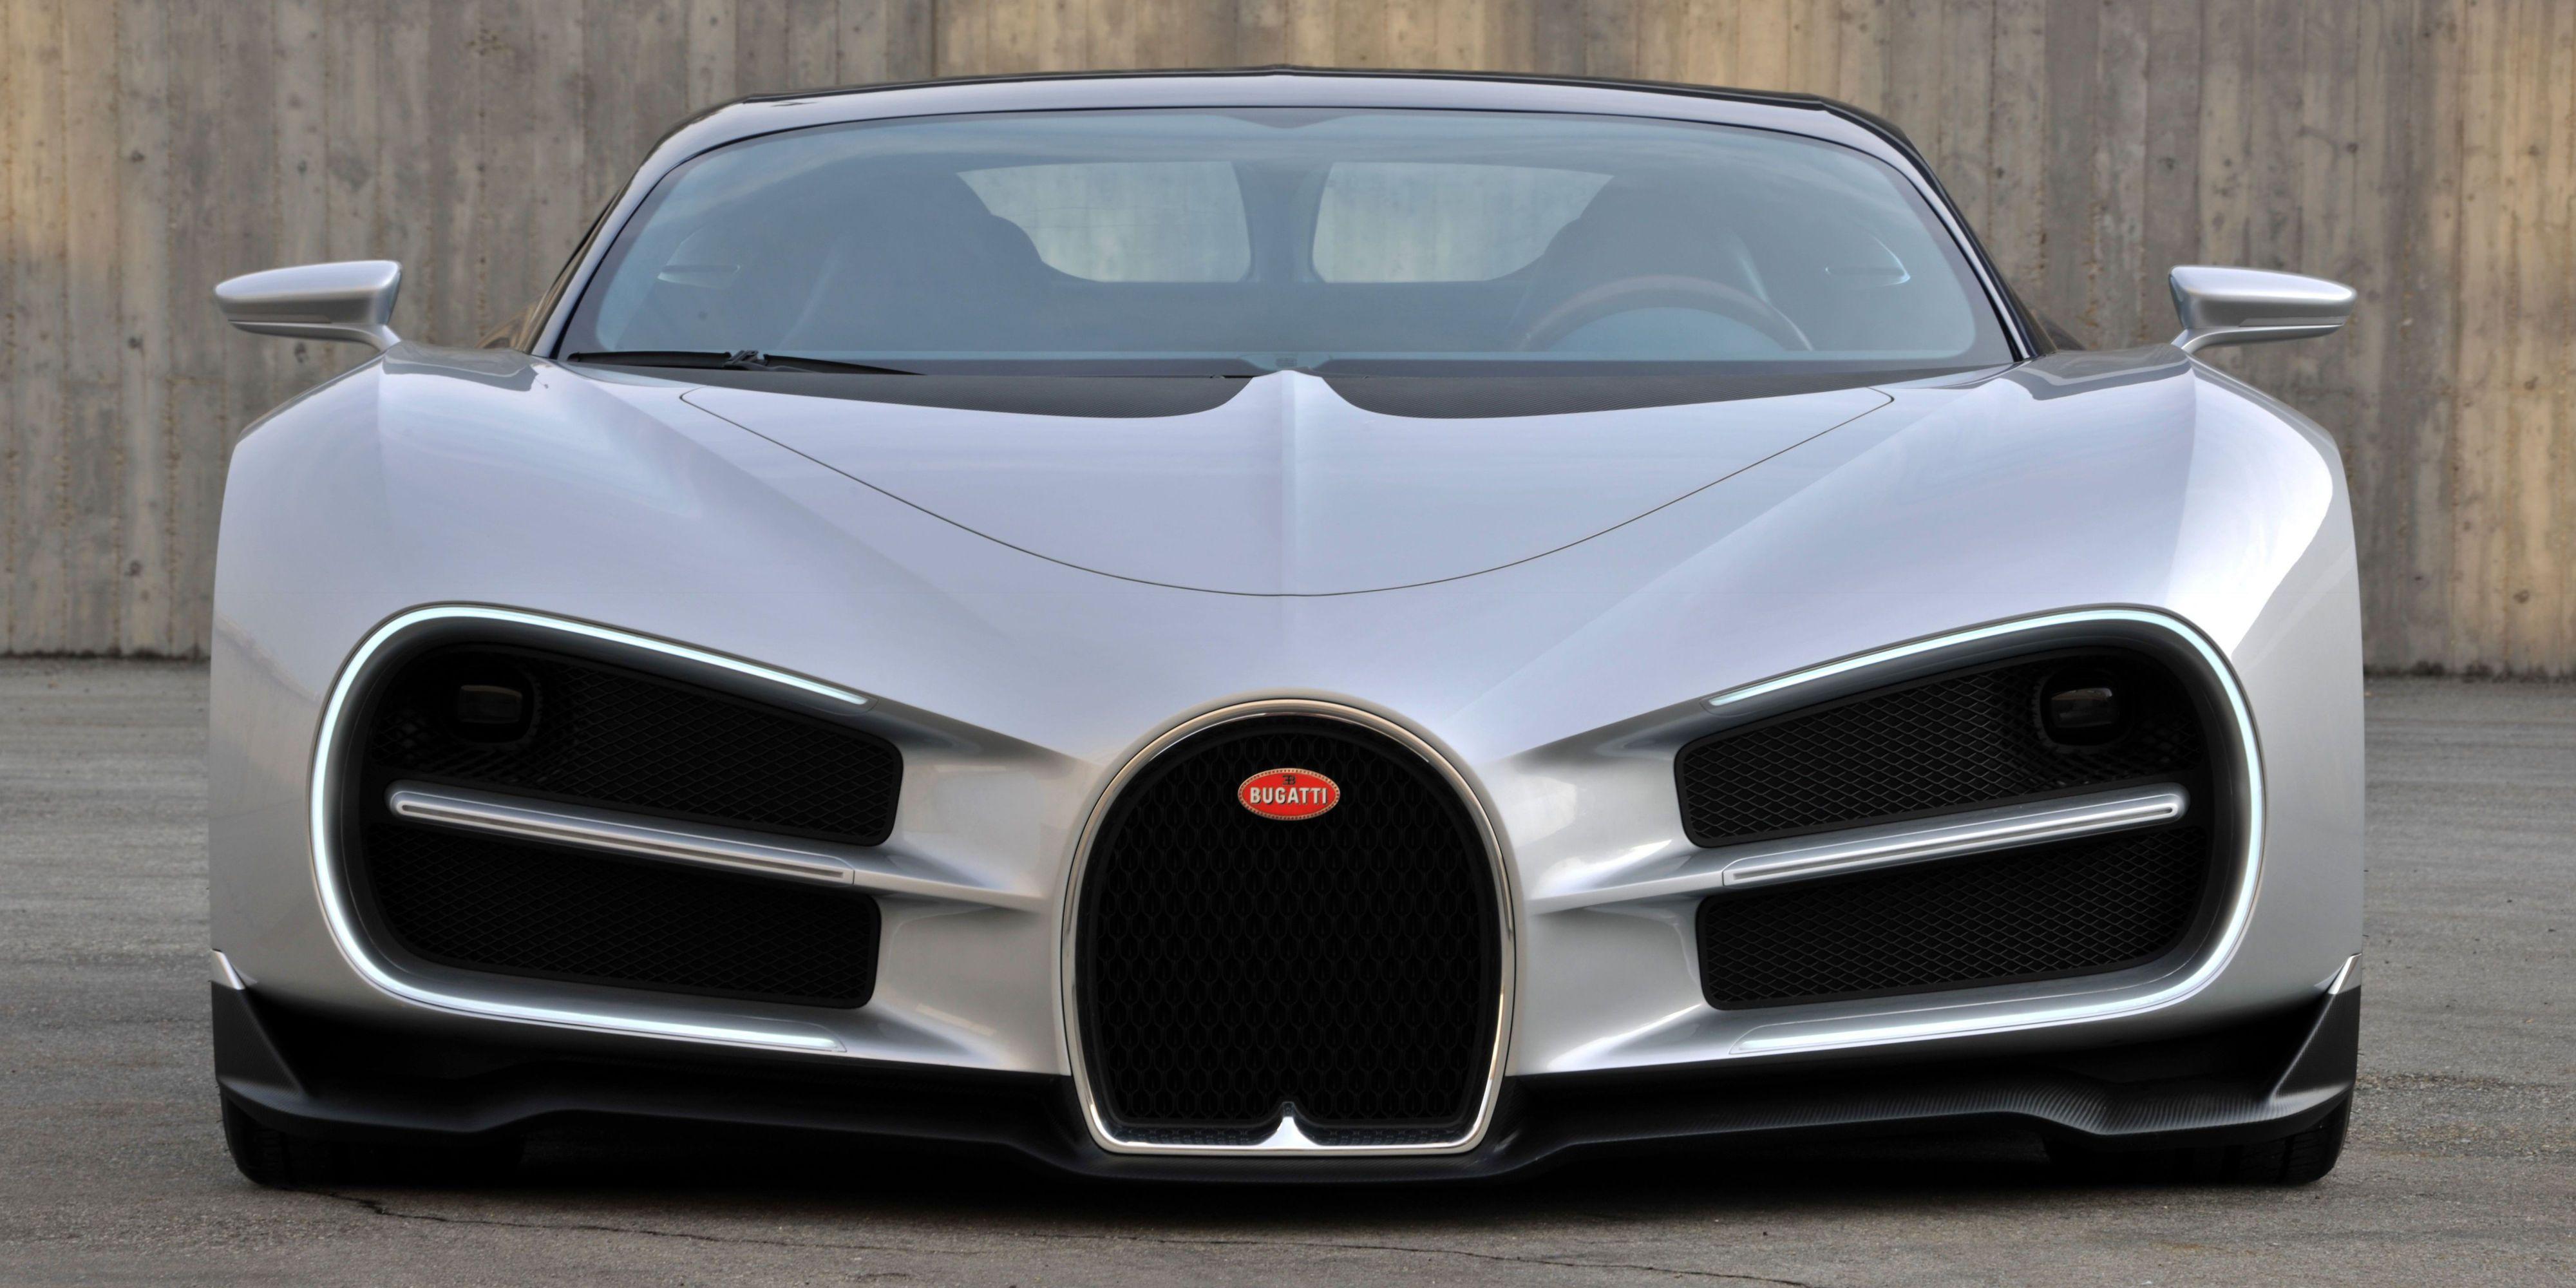 Bugatti's Head Exterior Designer Is Going to Hyundai's Luxury Brand